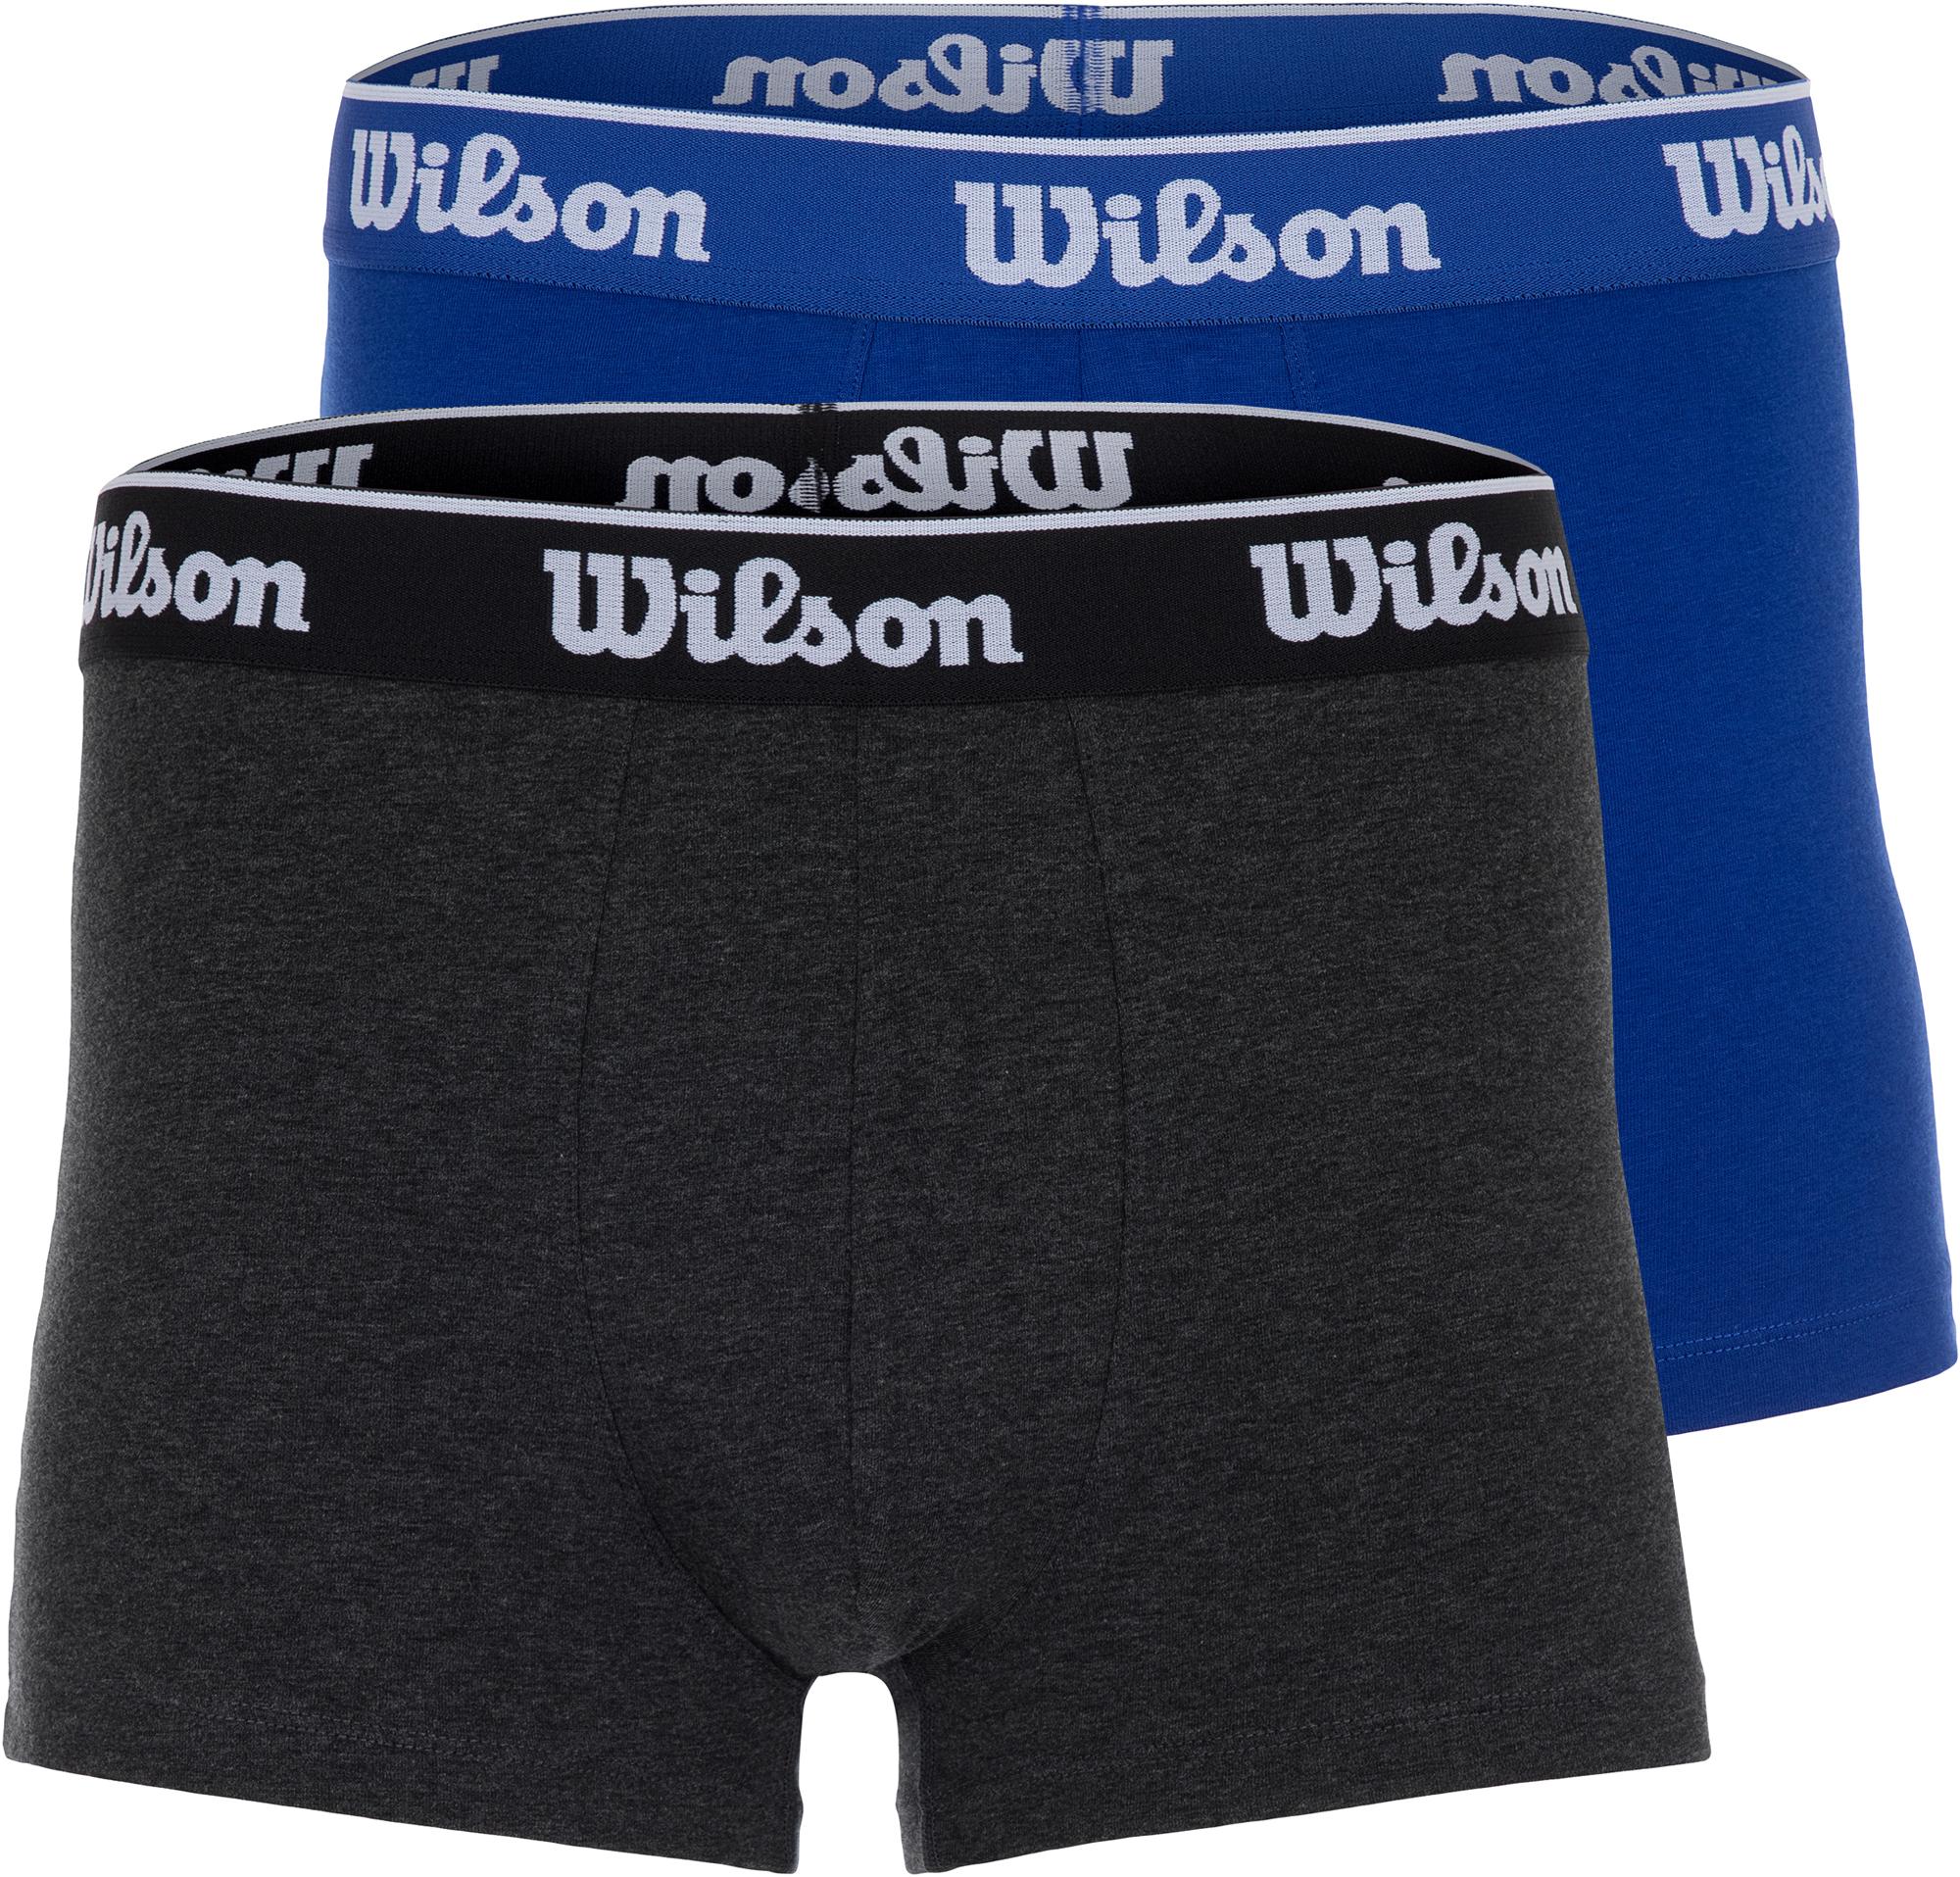 цены на Wilson Трусы мужские Wilson, 2 пары, размер 58-60  в интернет-магазинах